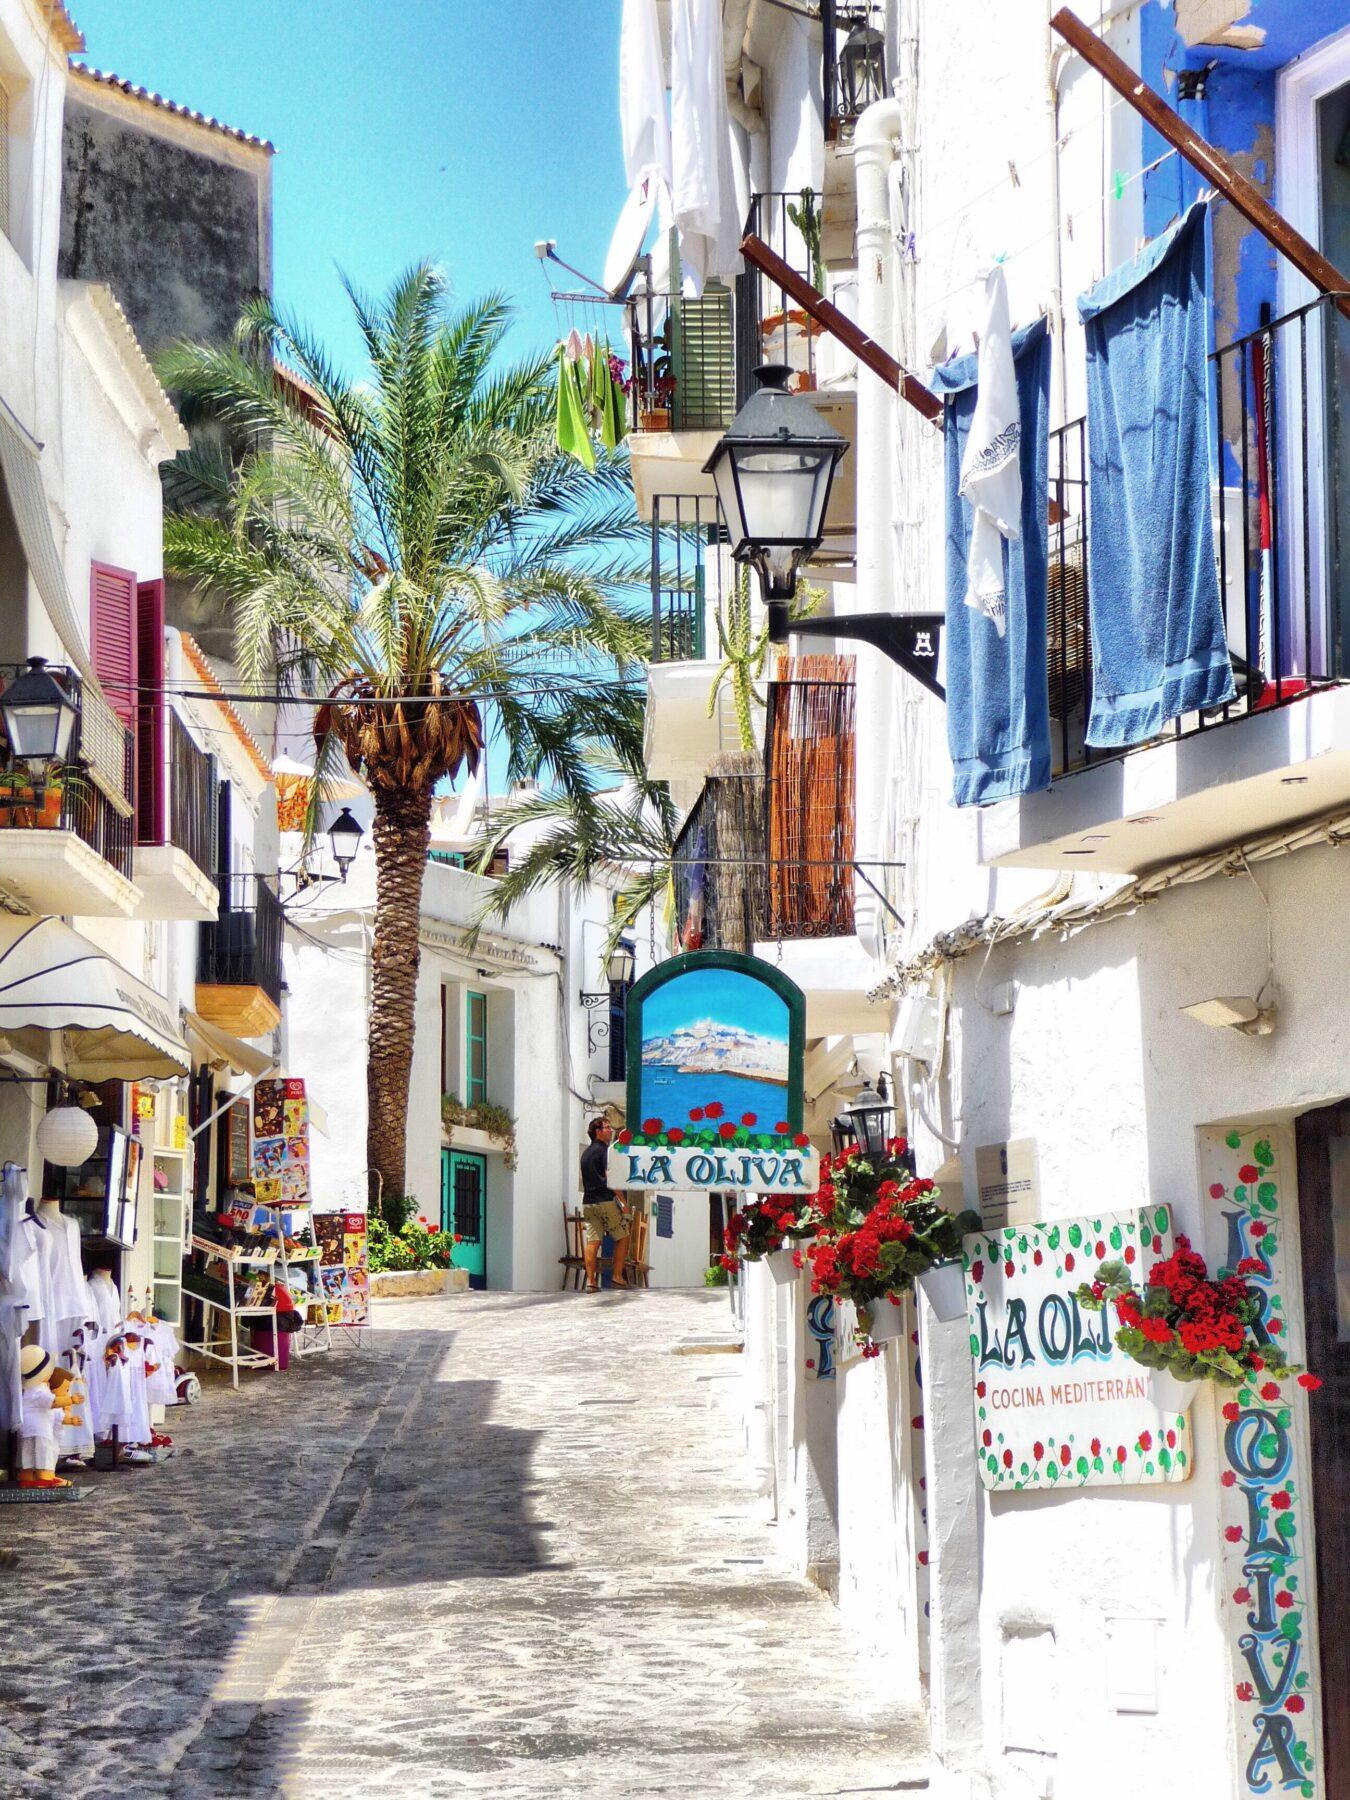 Mooiste eilanden Europa, Ibiza straatje